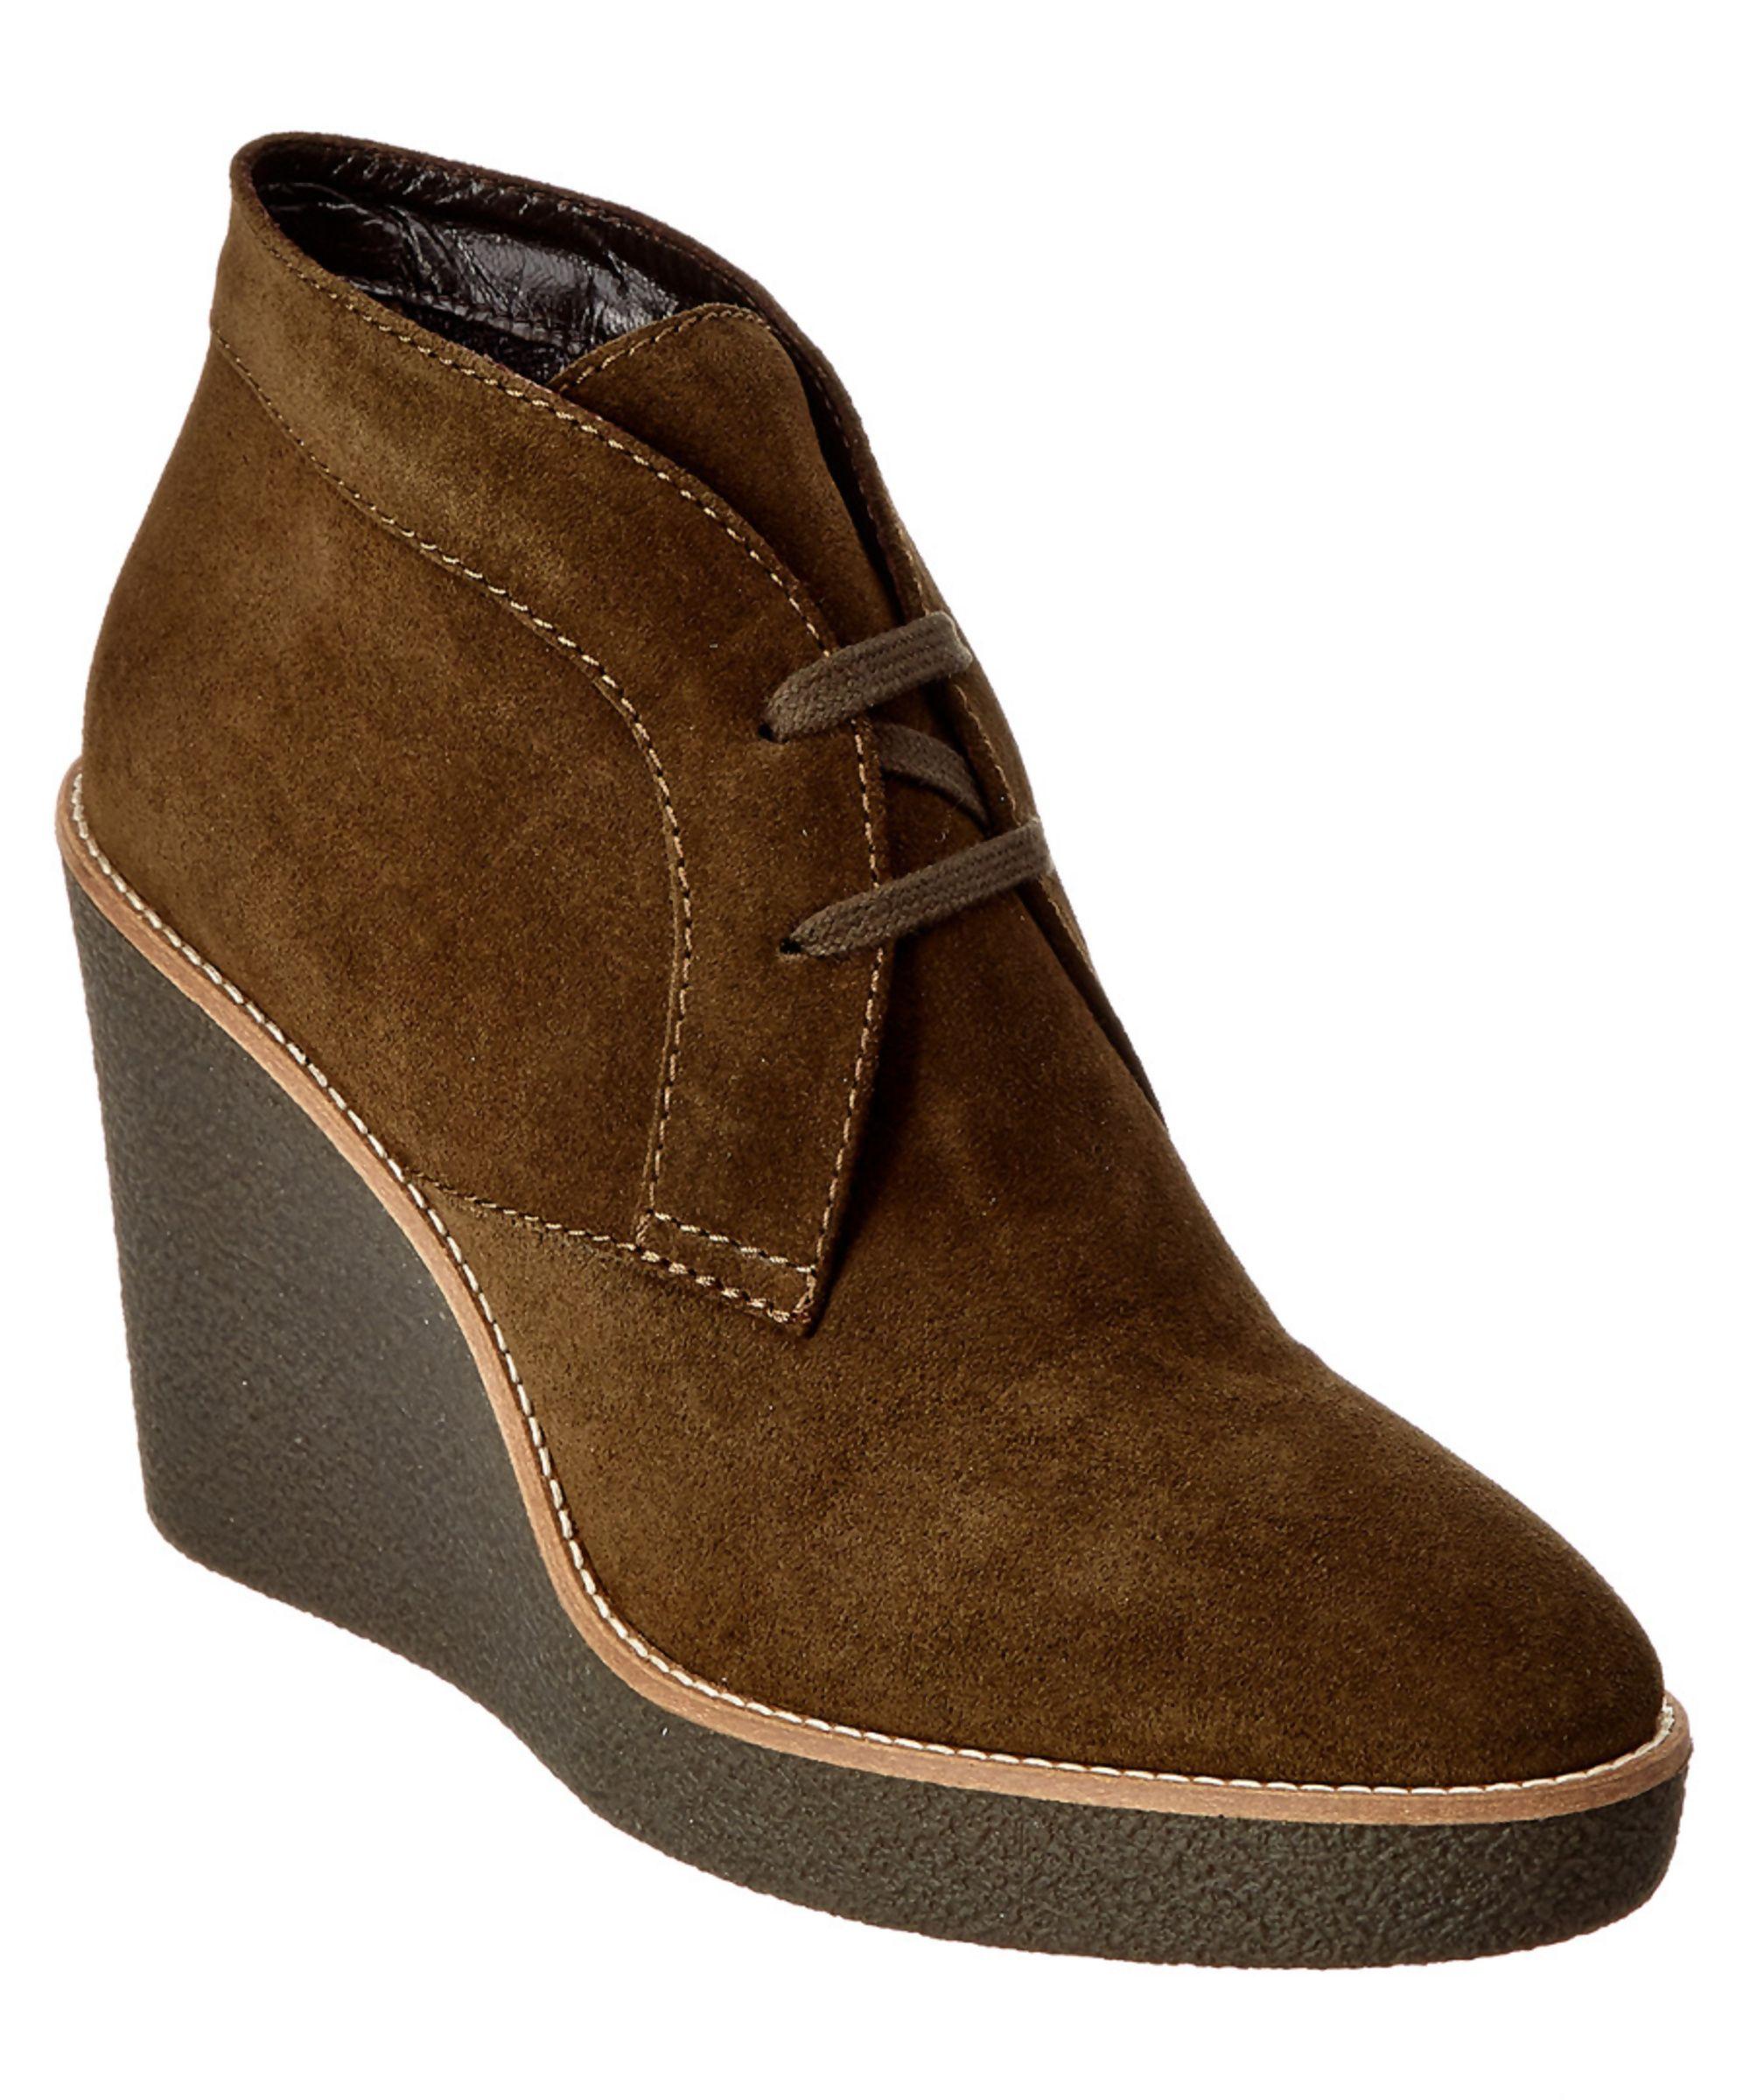 AQUATALIA   Aquatalia Vianna Waterproof Suede Bootie #Shoes #Boots & Booties  #AQUATALIA